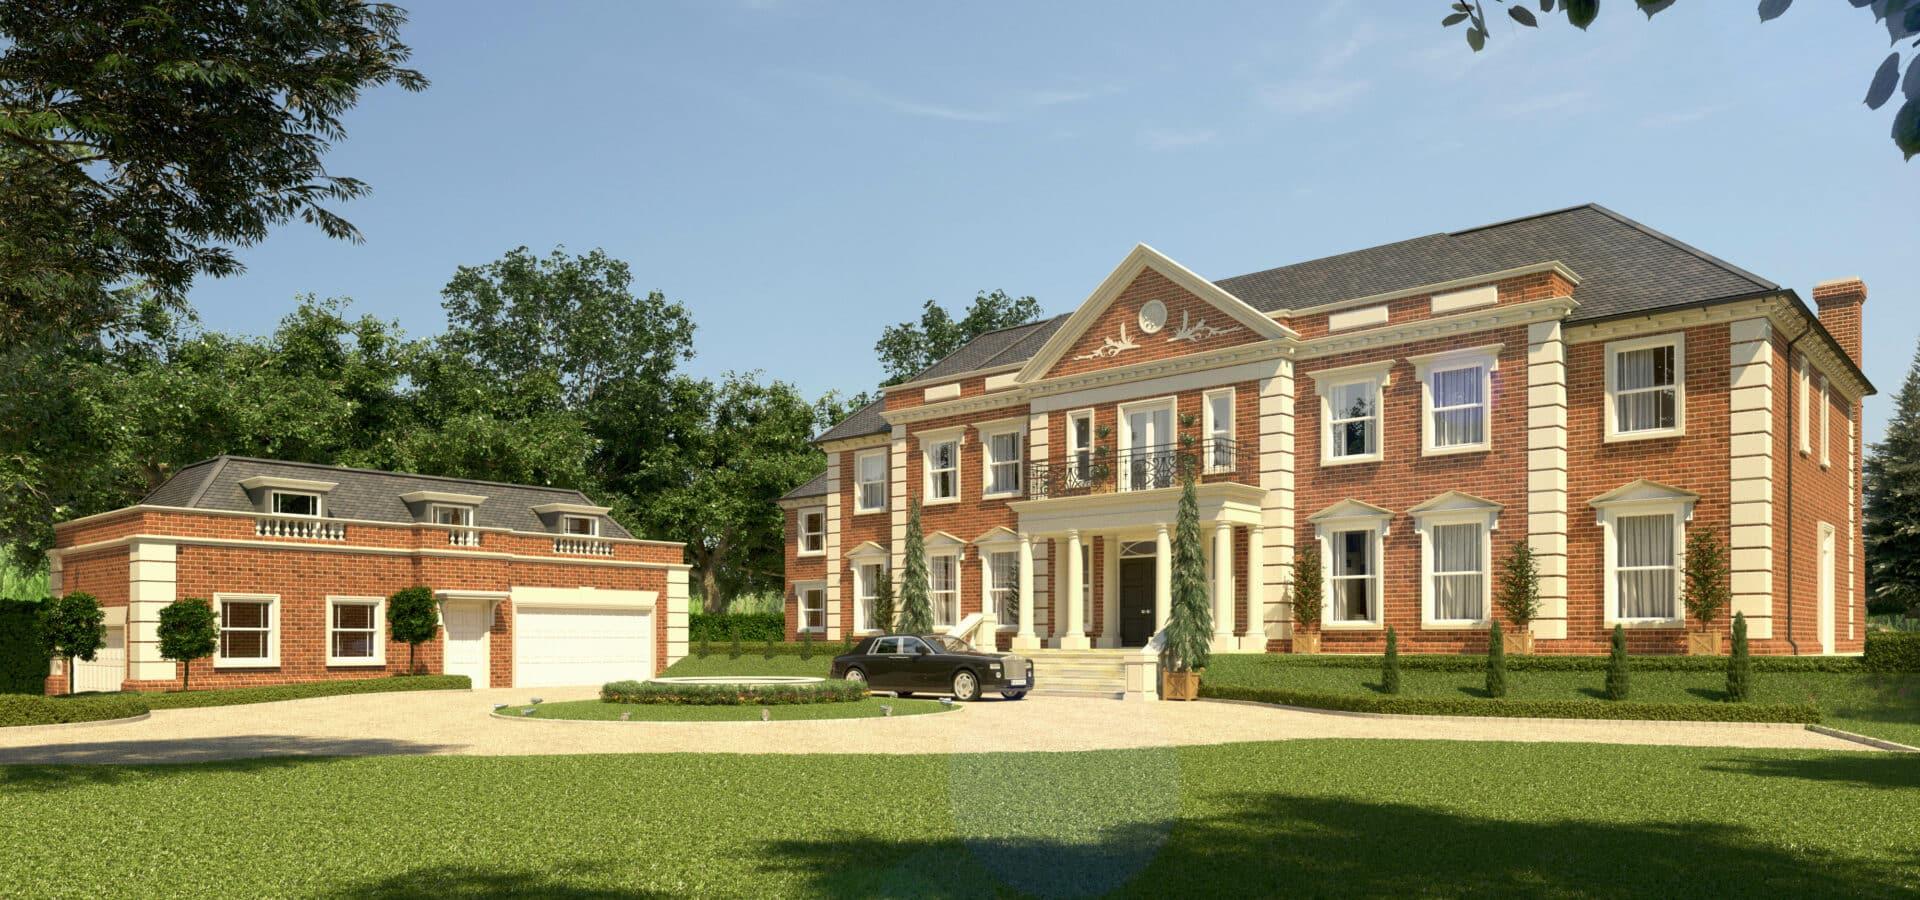 Titlarks House